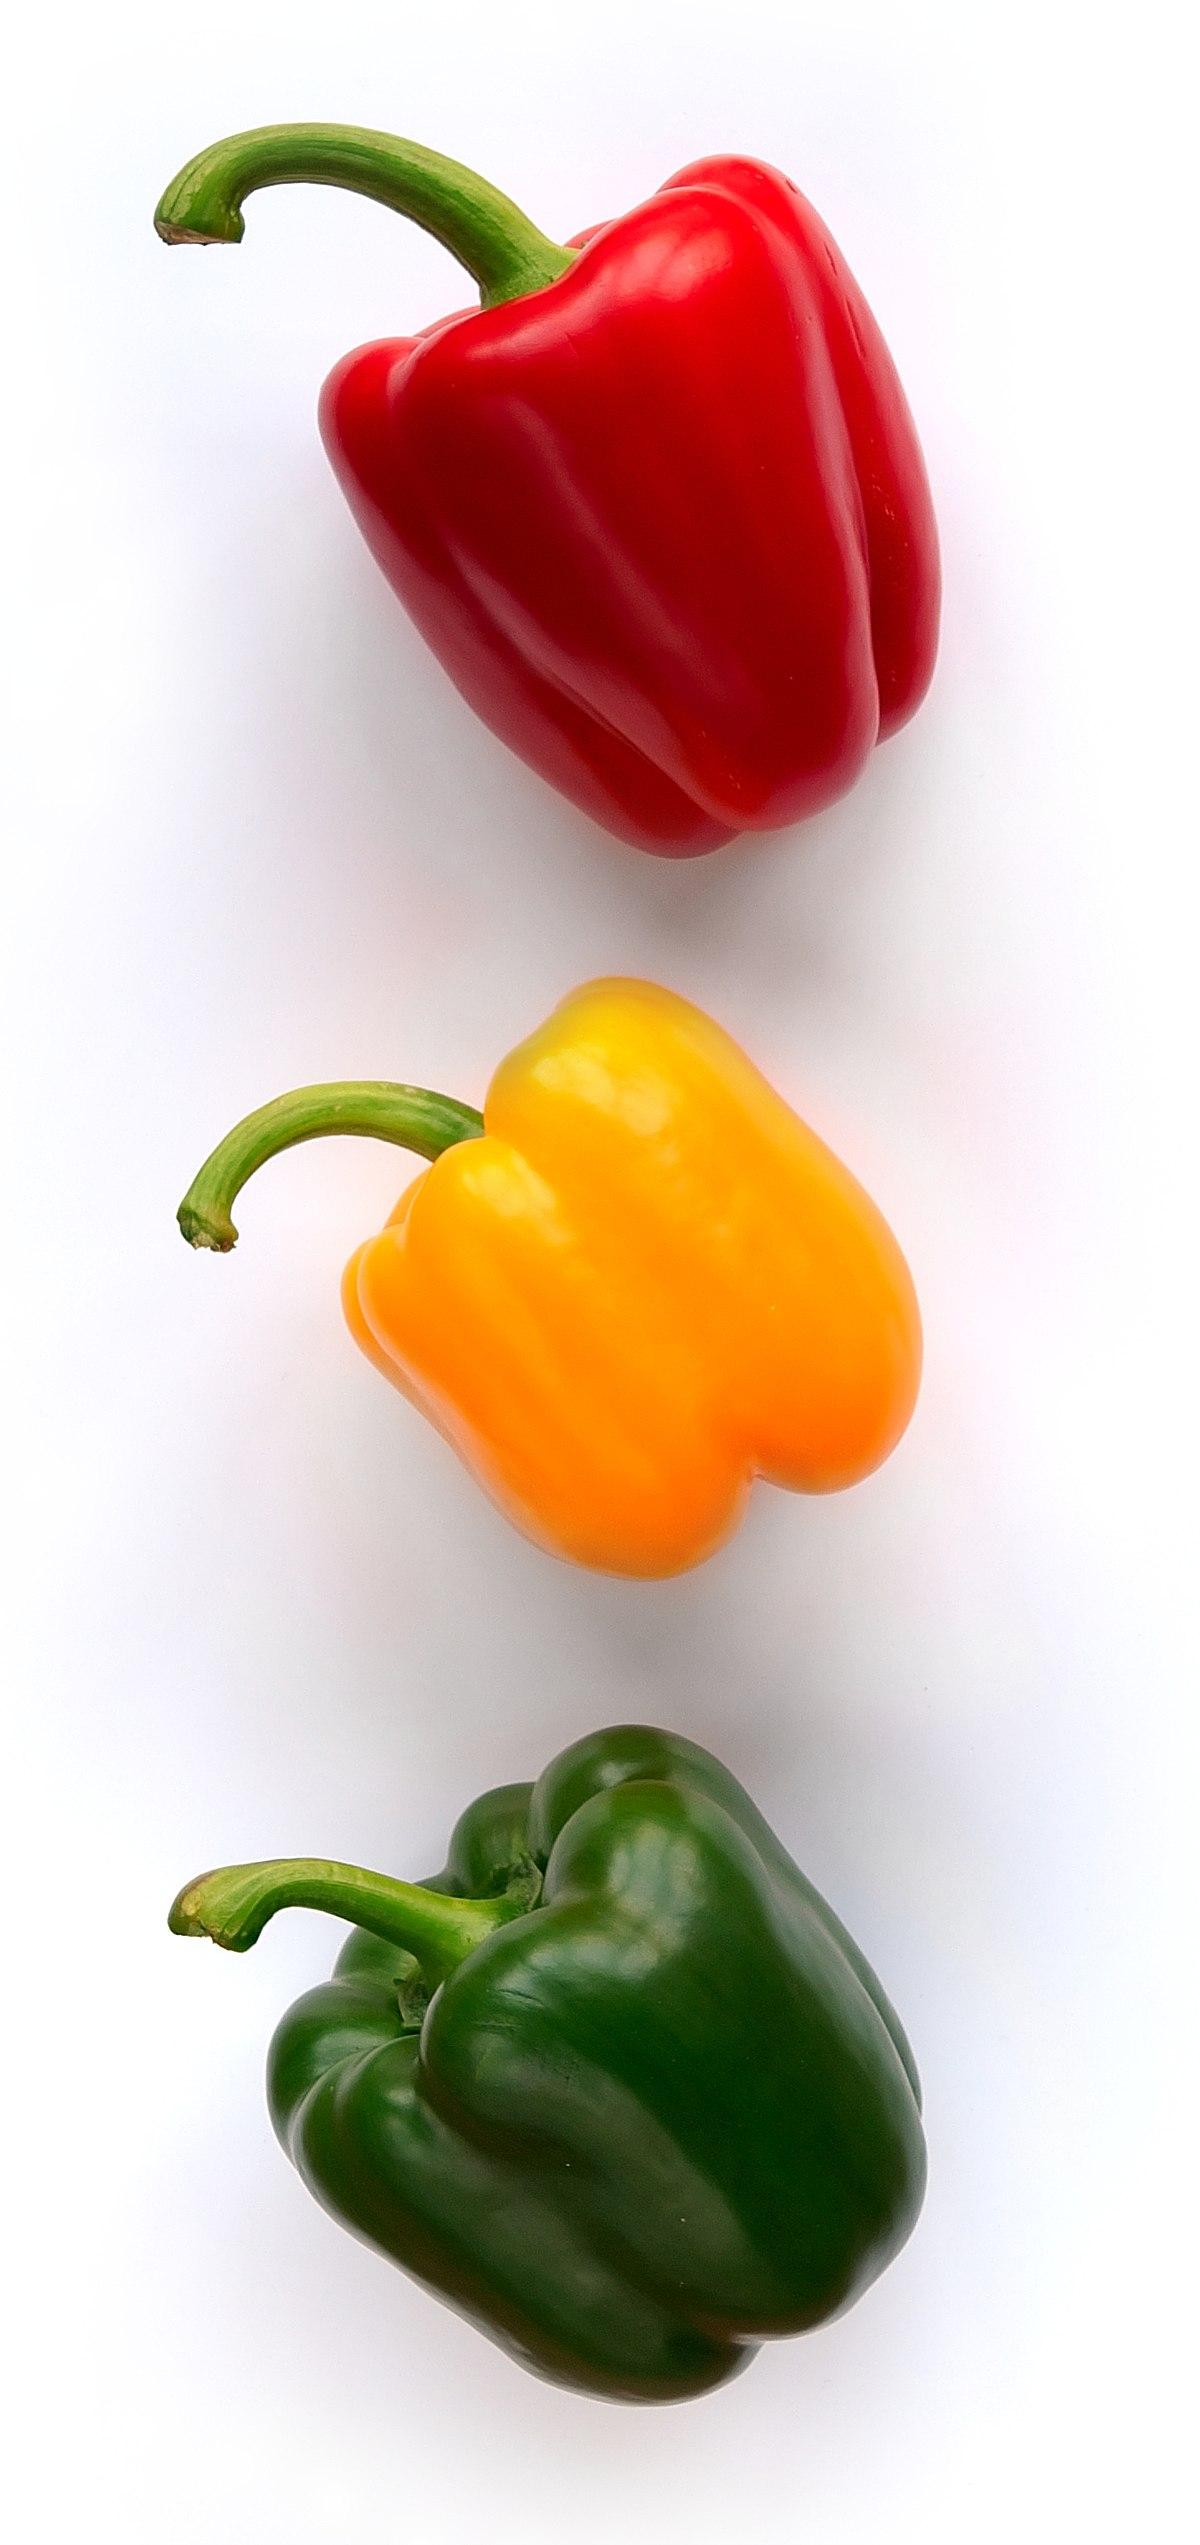 sweet pepper - Wiktionary